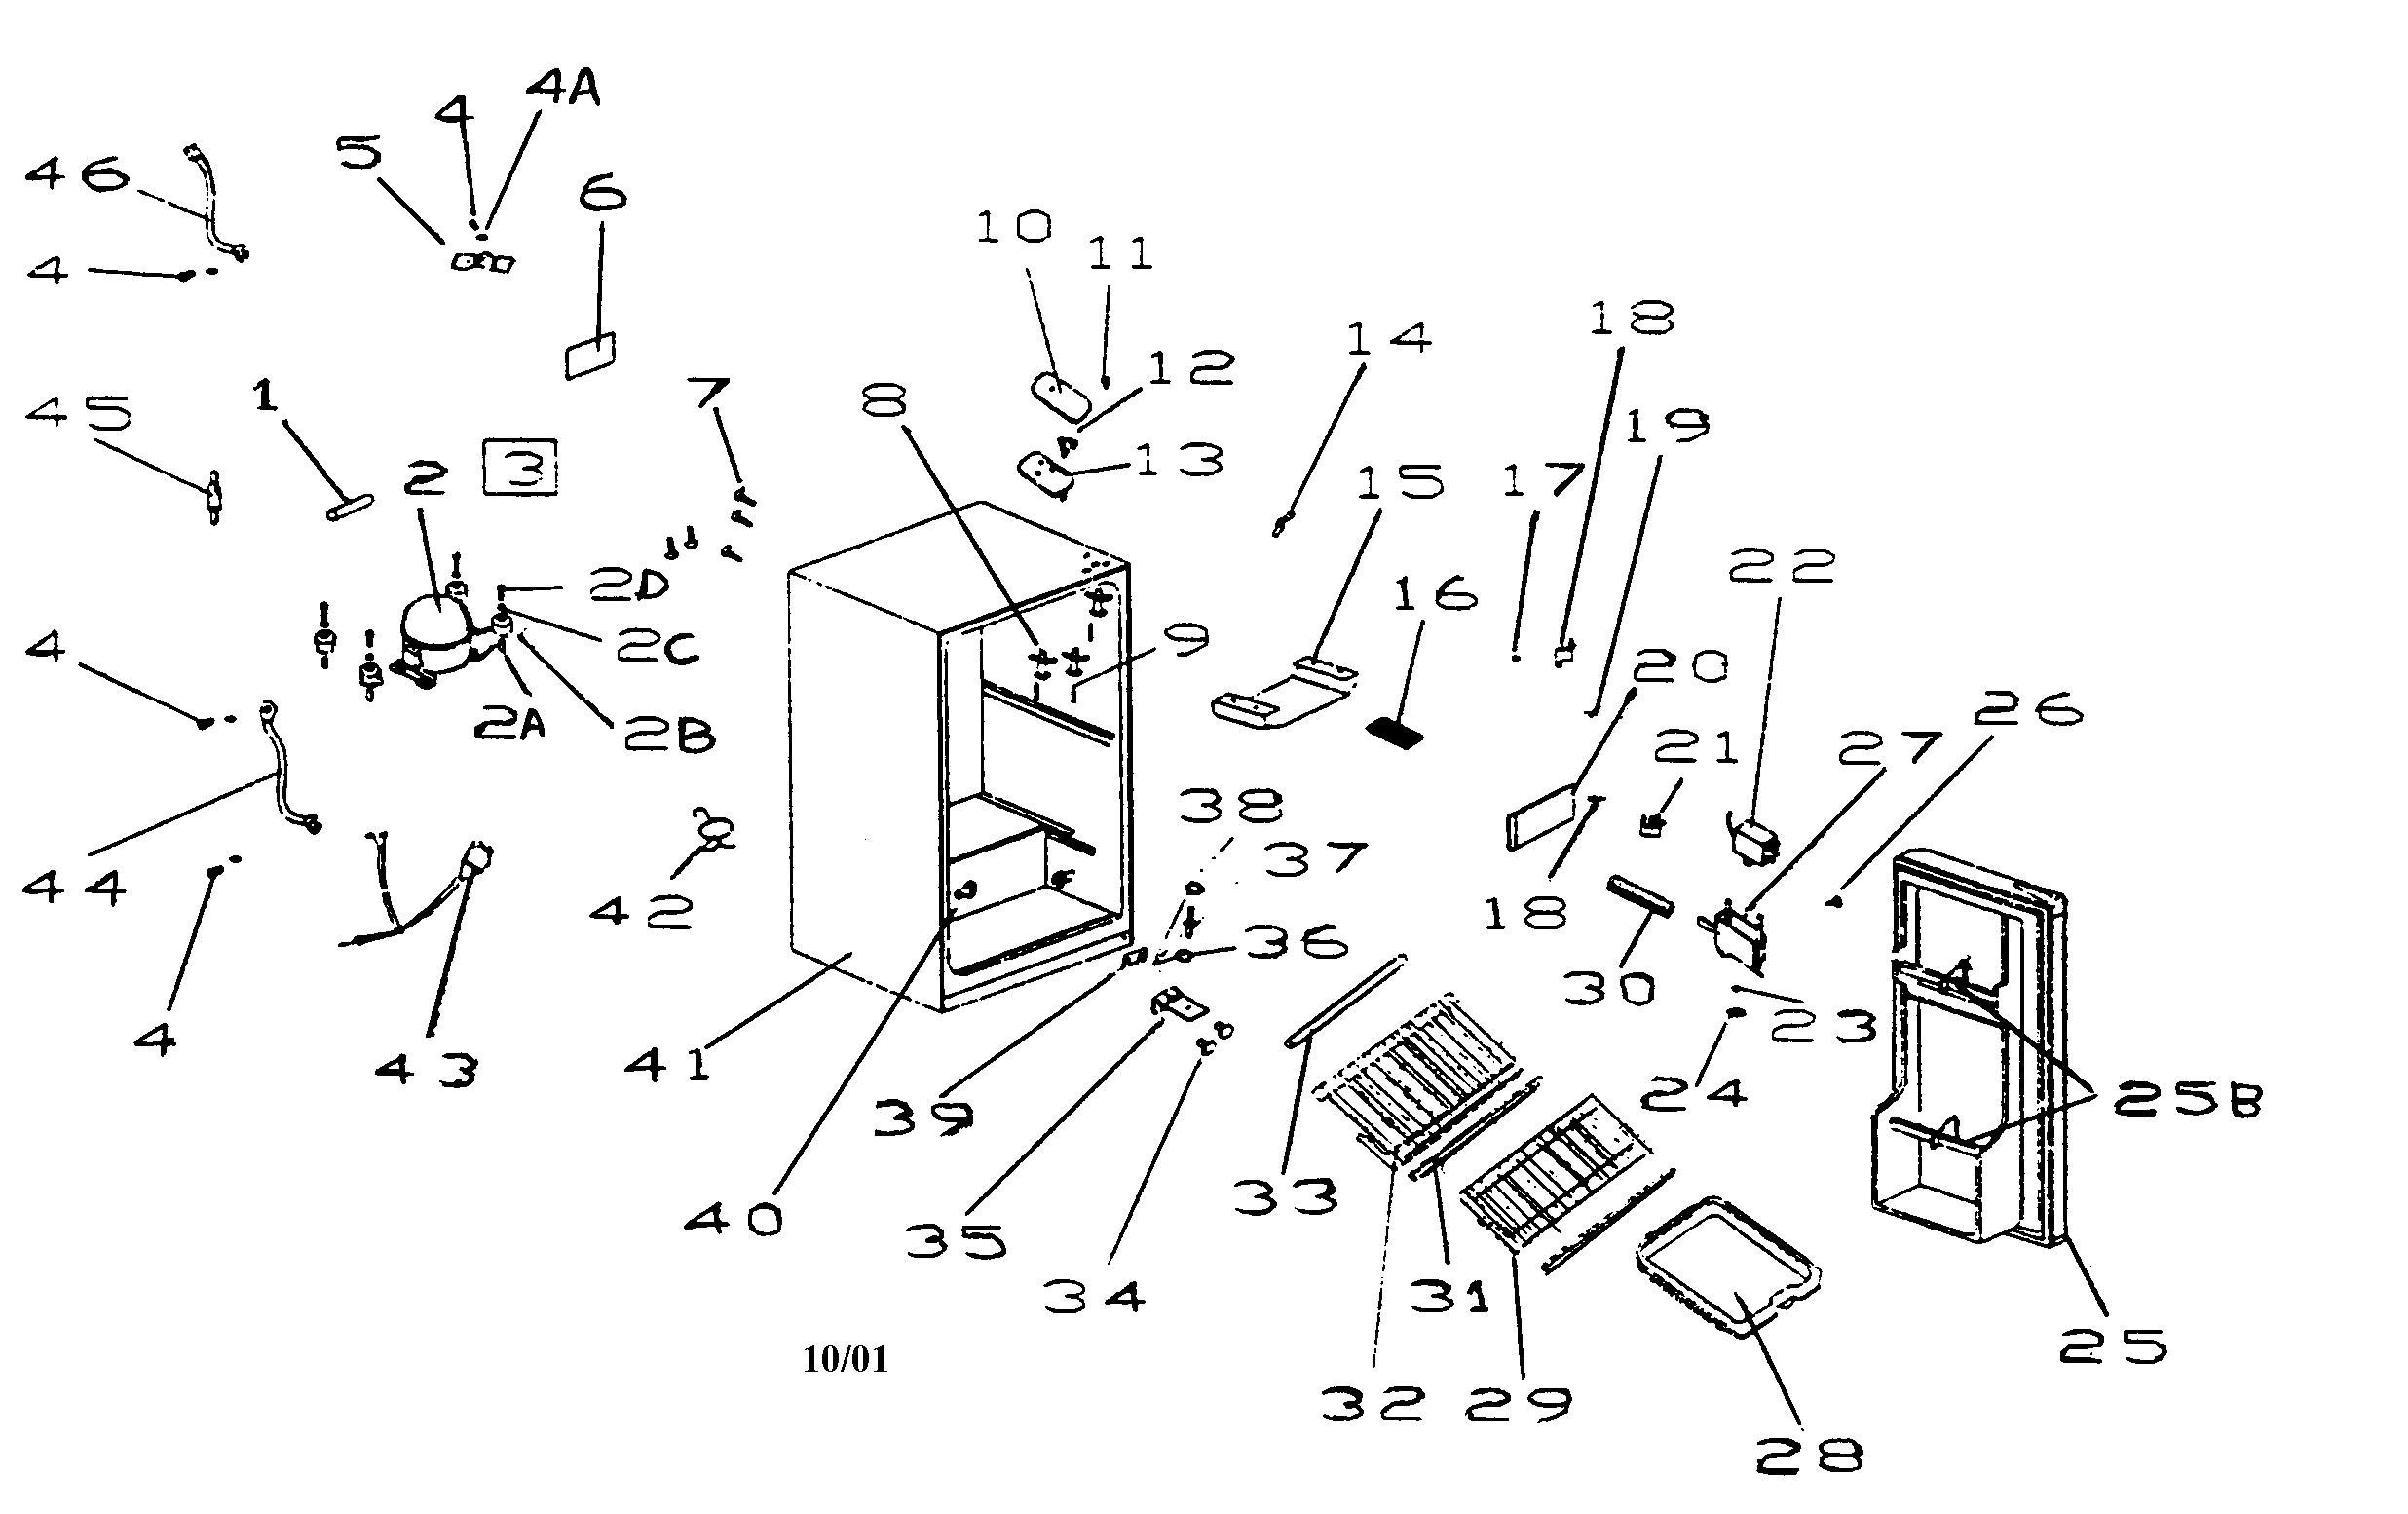 haier rrtg18pabw refrigerator wiring diagram